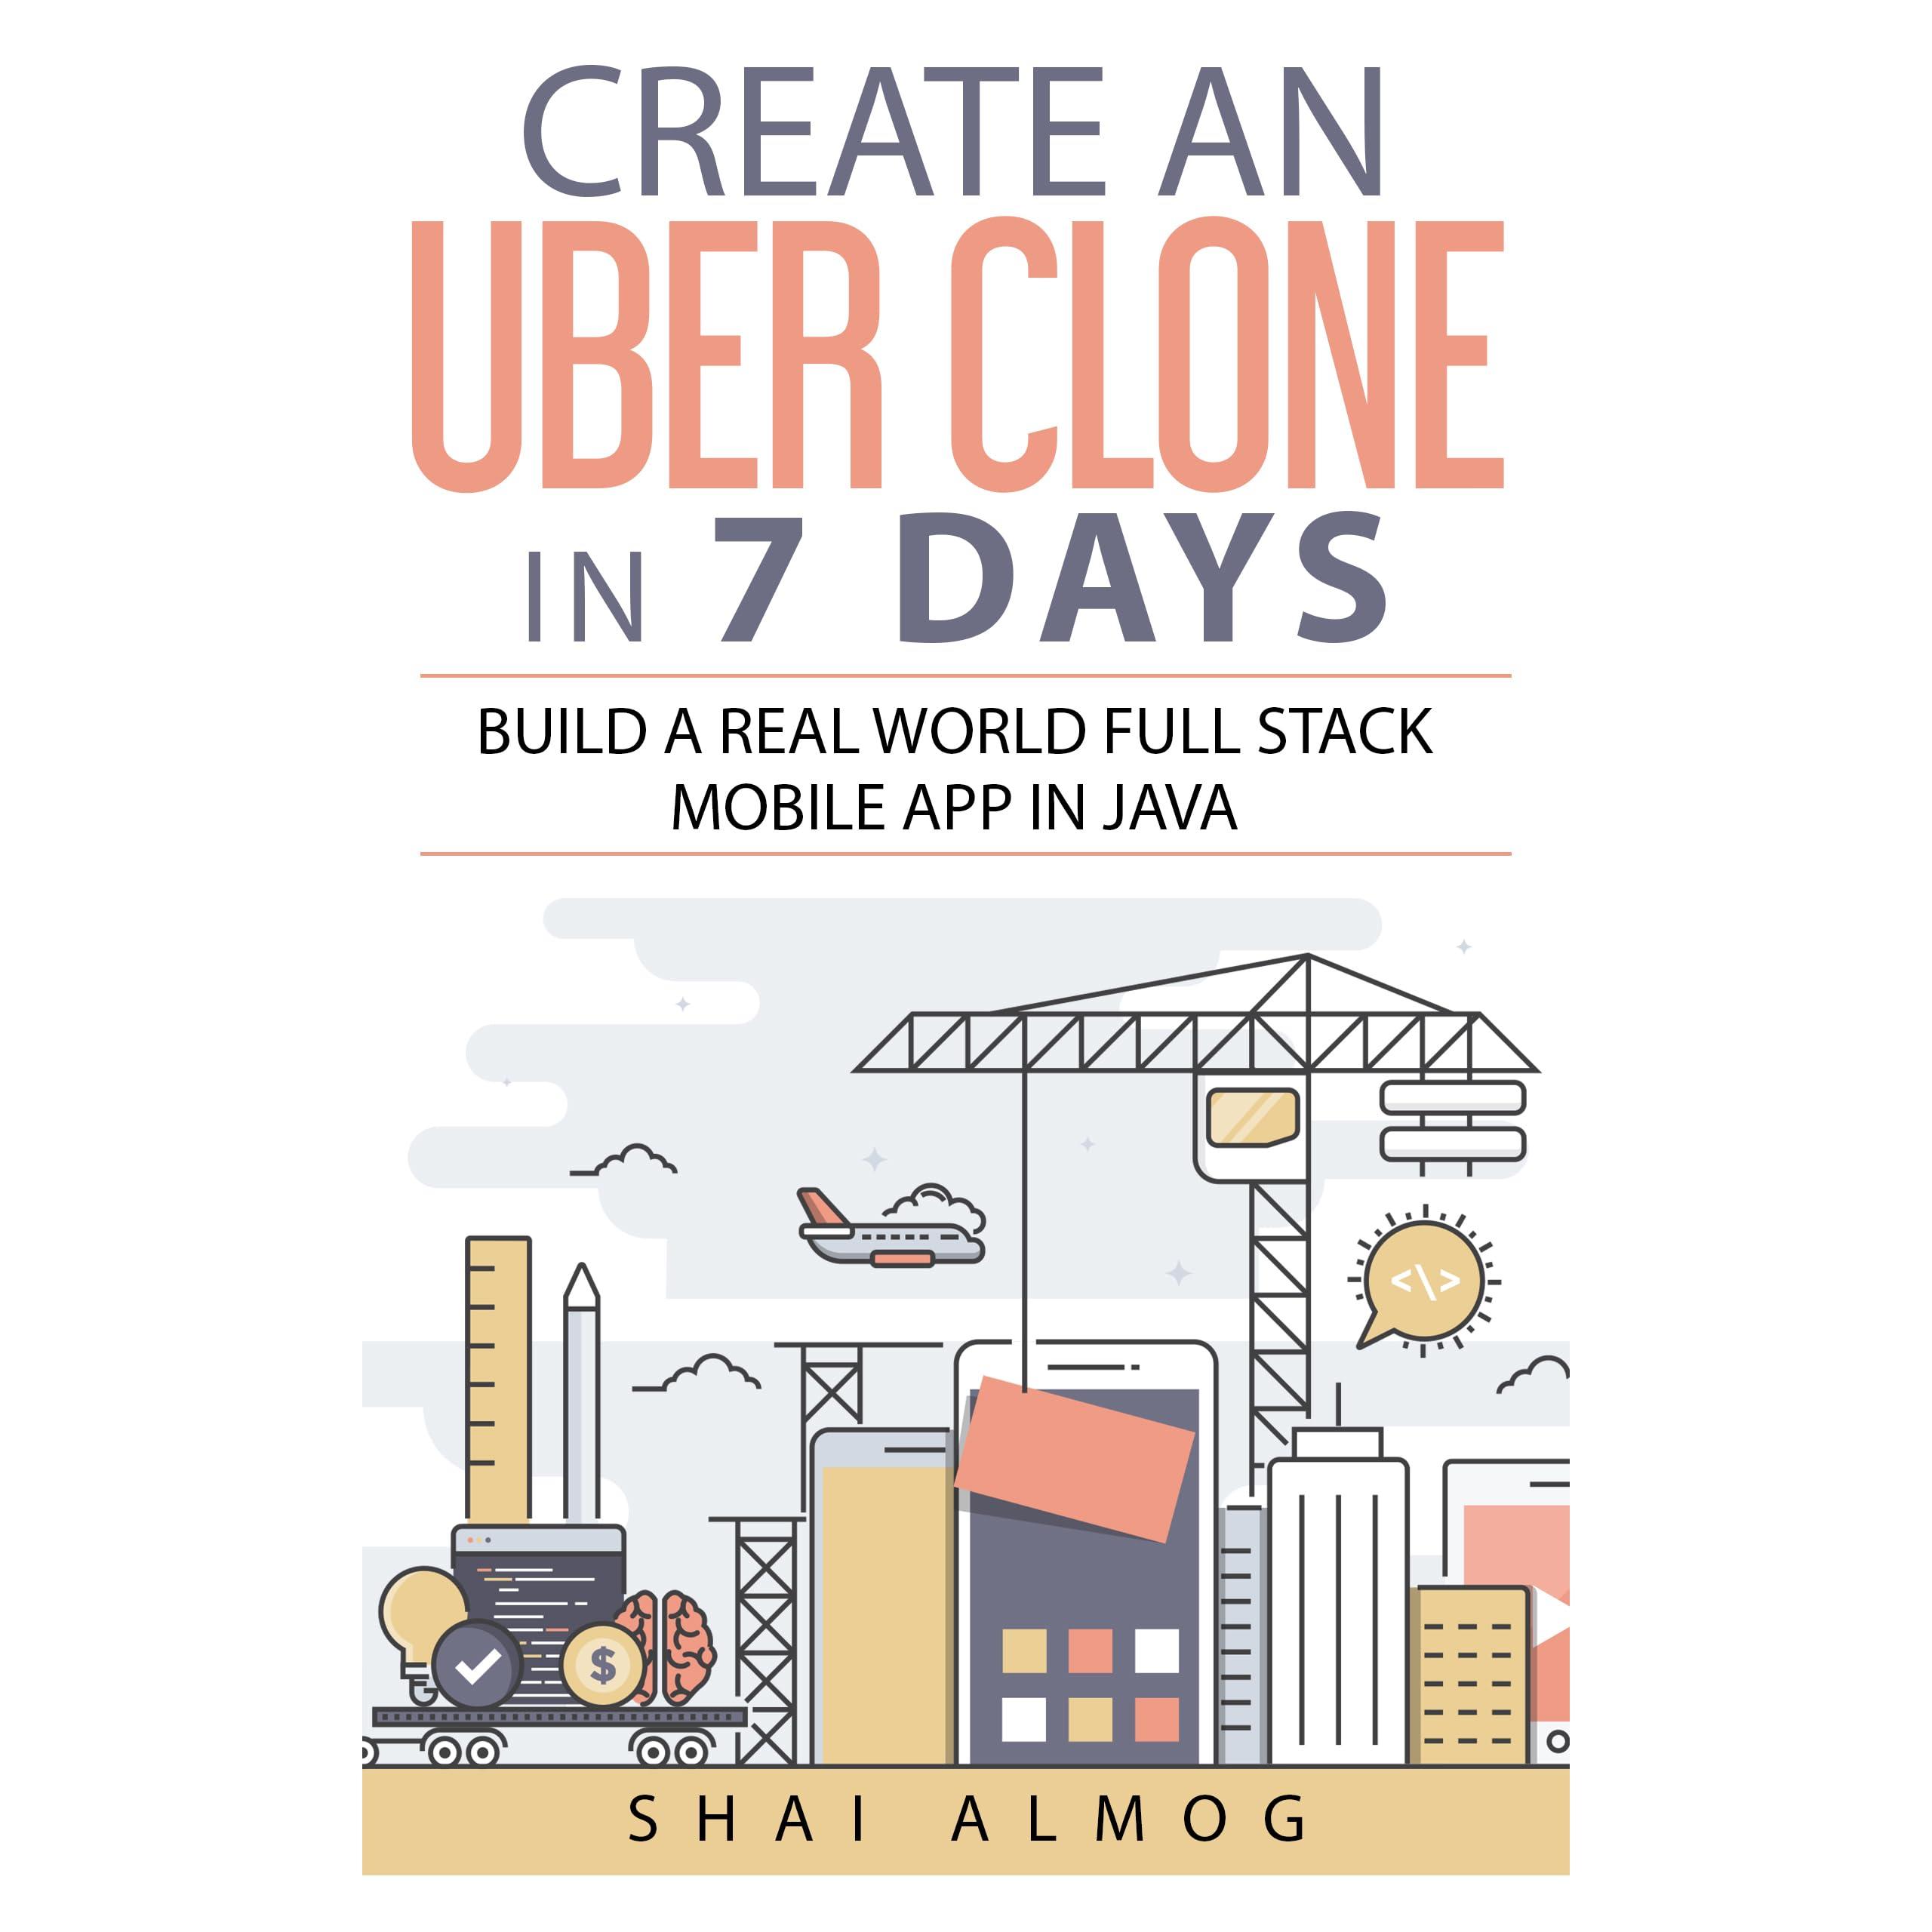 Create an Uber Clone in 7 Days by Shai Almog